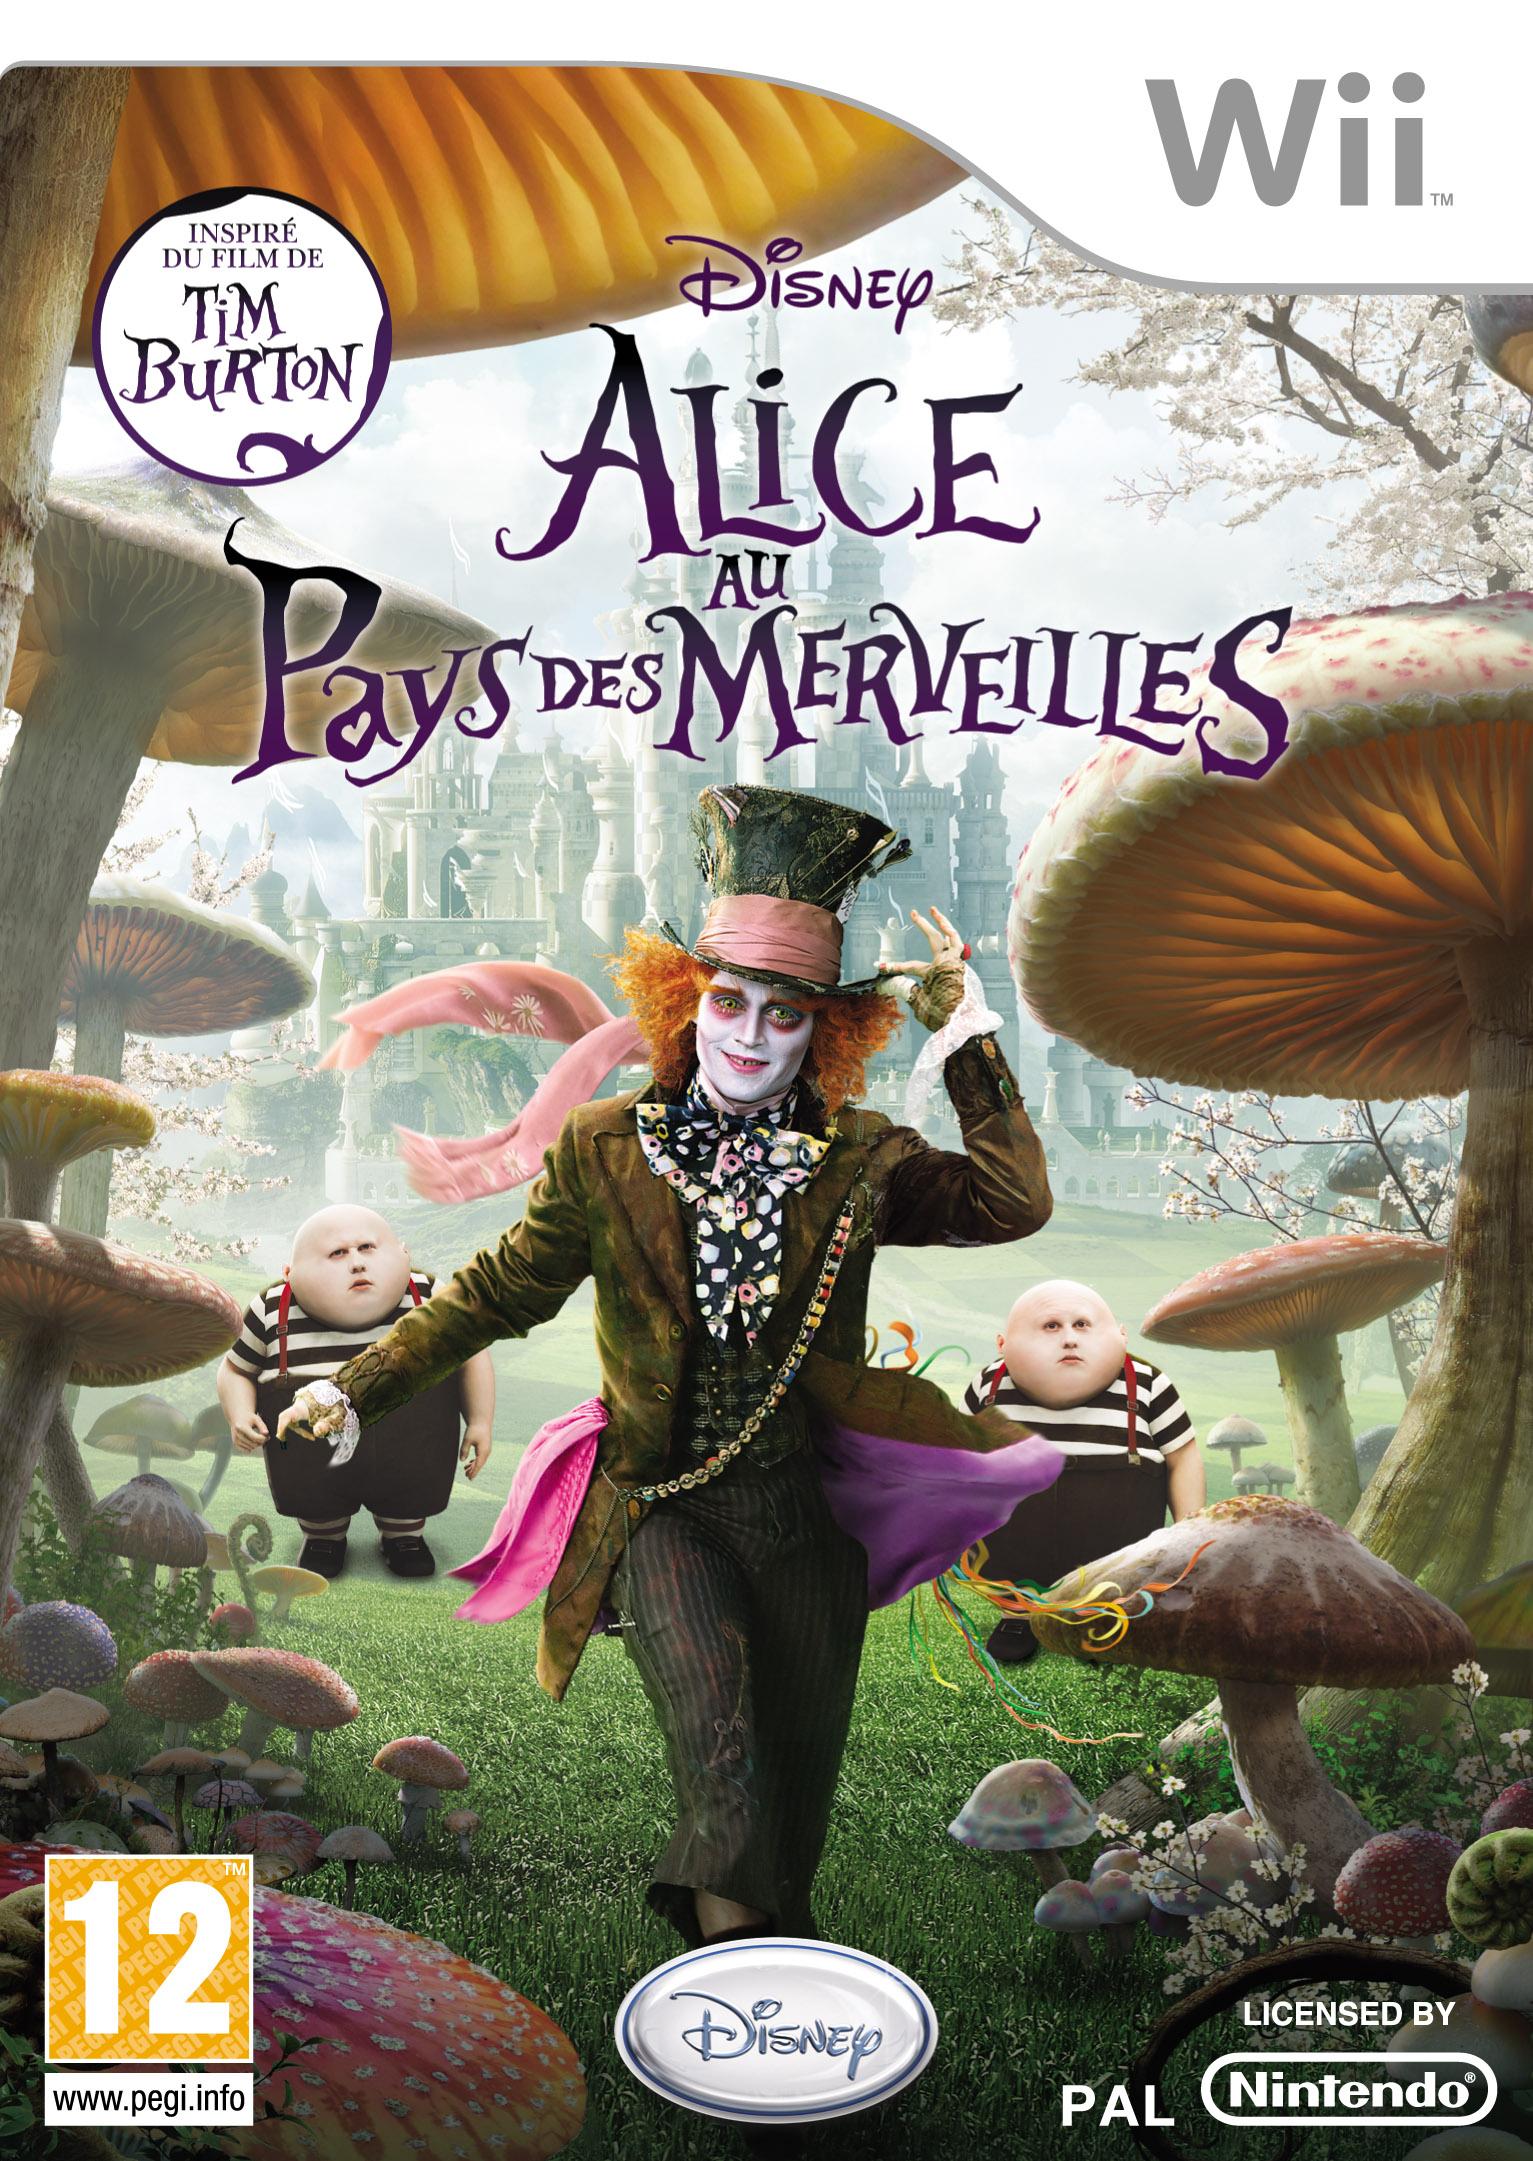 Alice au Pays des Merveilles Burton Jeu vidéo Wii Disney